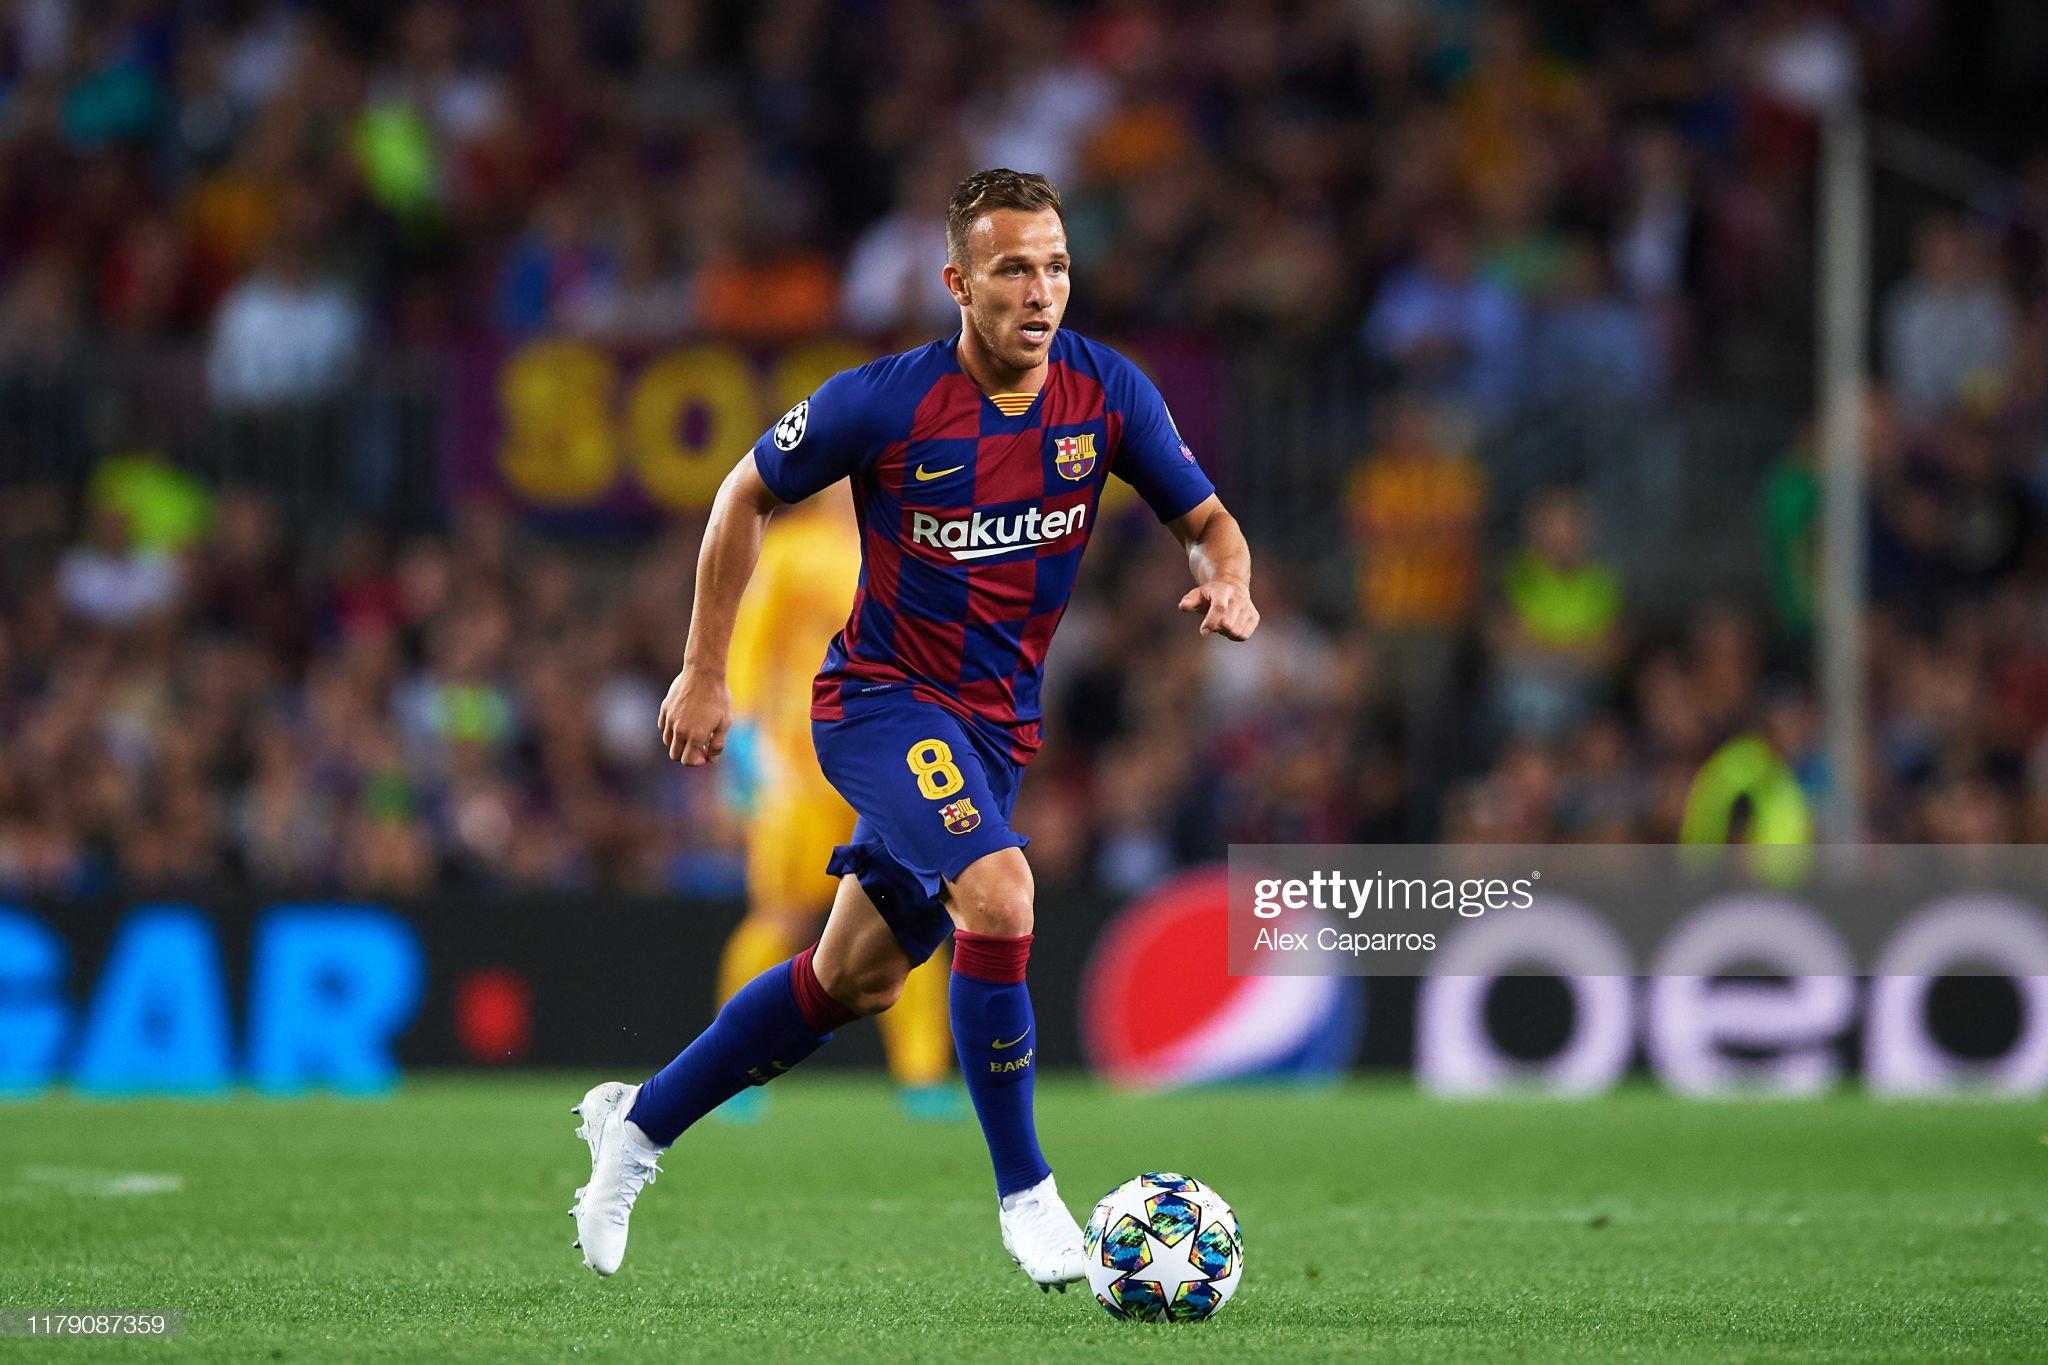 صور مباراة : برشلونة - إنتر 2-1 ( 02-10-2019 )  Arthur-melo-of-fc-barcelona-conducts-the-ball-during-the-uefa-league-picture-id1179087359?s=2048x2048